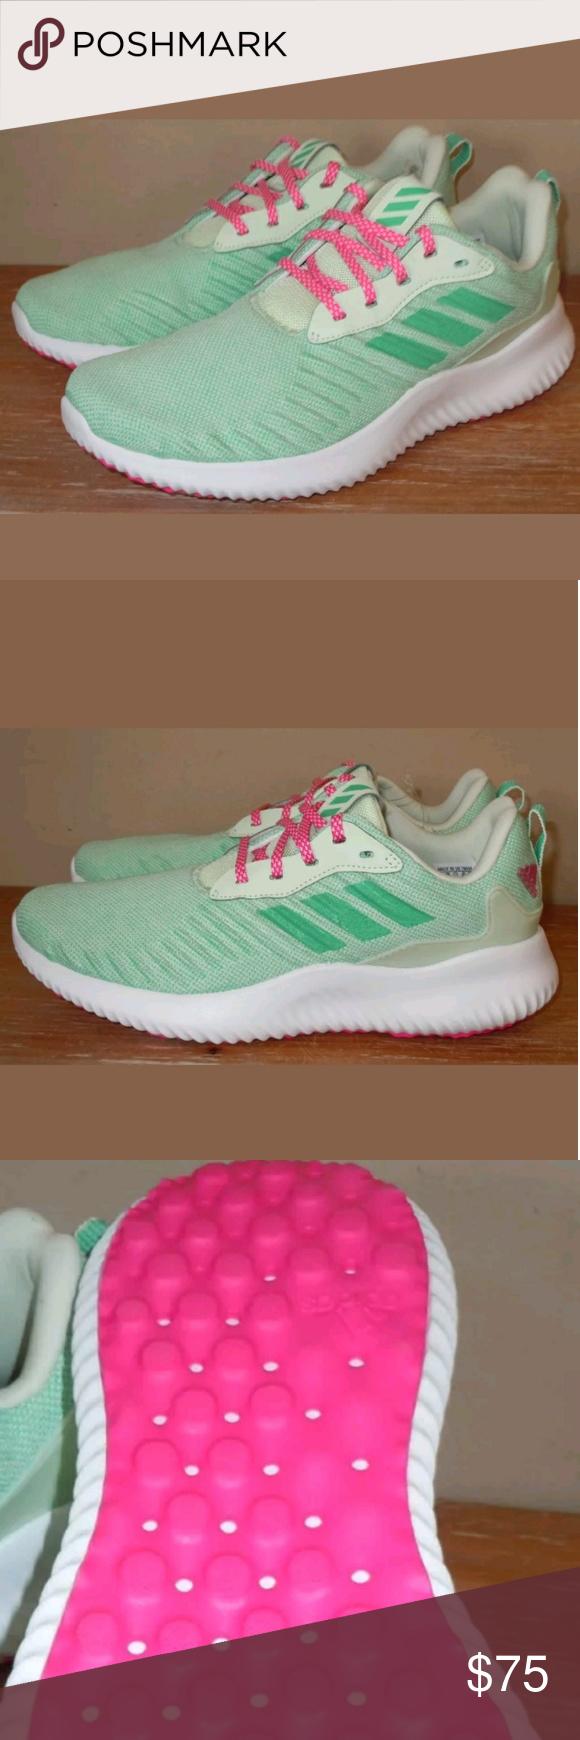 c0fe4b7b299ae NWOB adidas   Alphabounce Rc Running Shoe 6.5 adidas   Alphabounce Rc  Running Shoe Aero Green